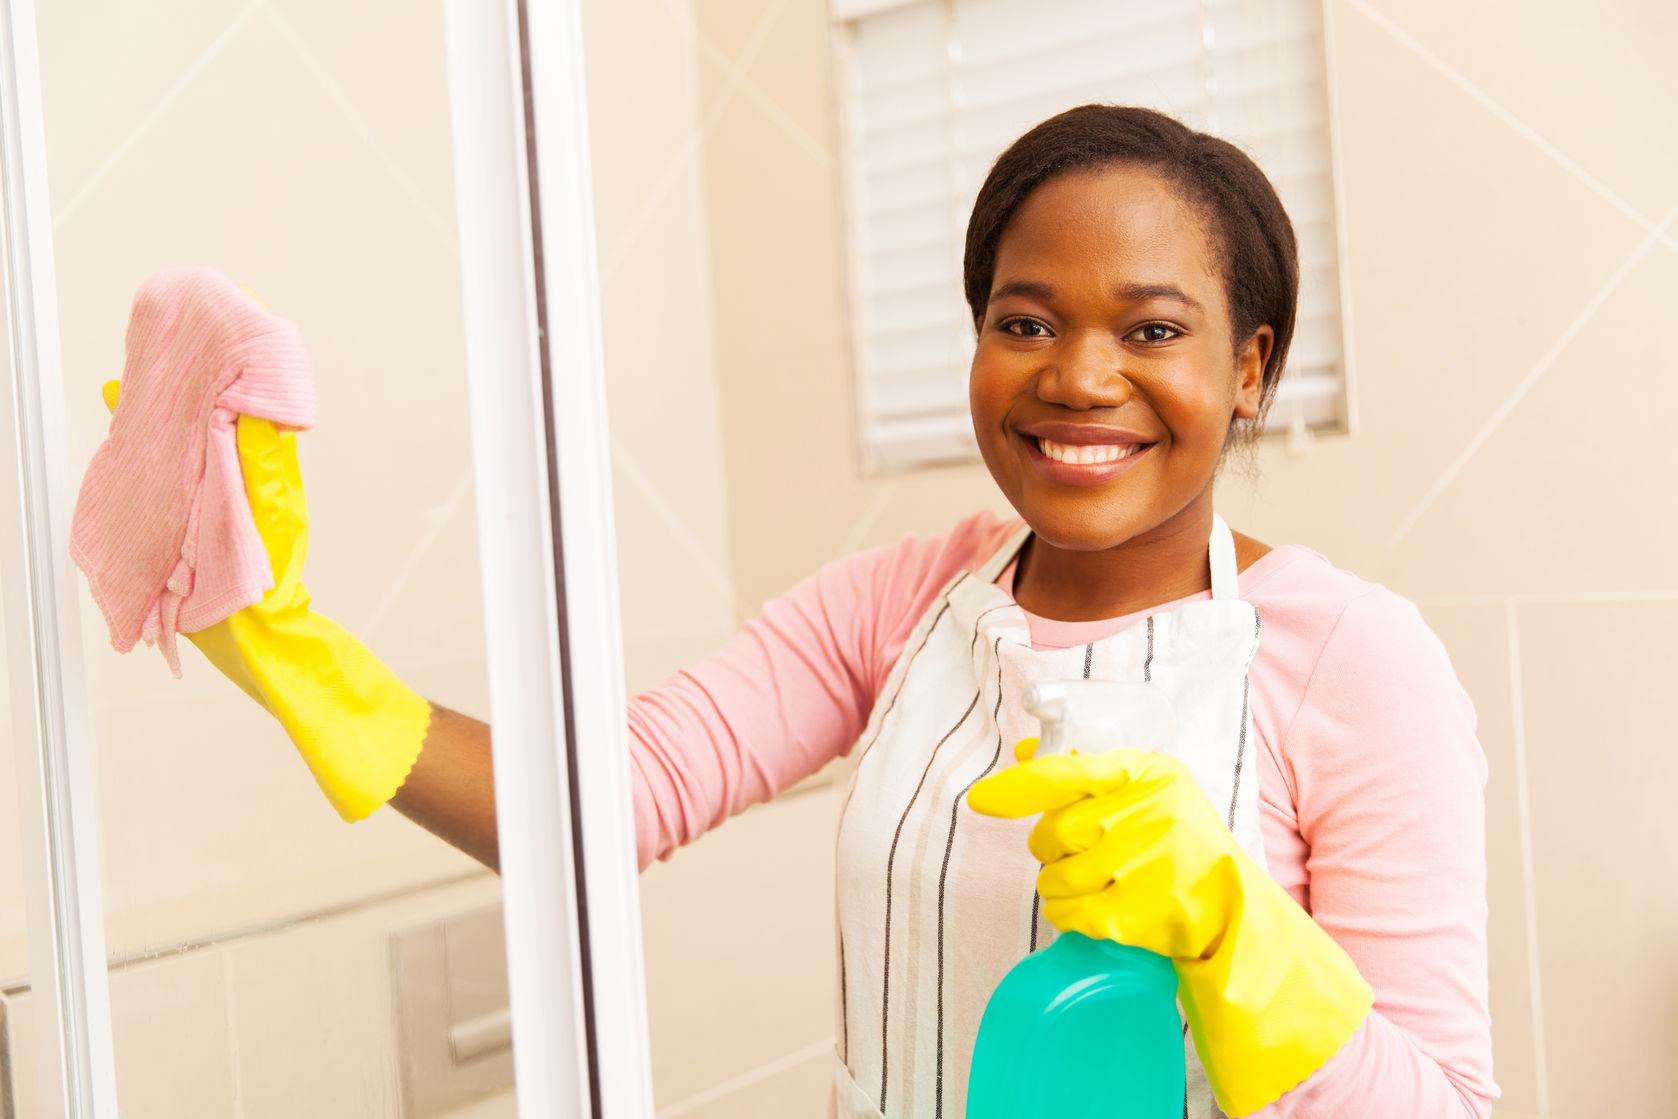 Apply bathroom cleaner